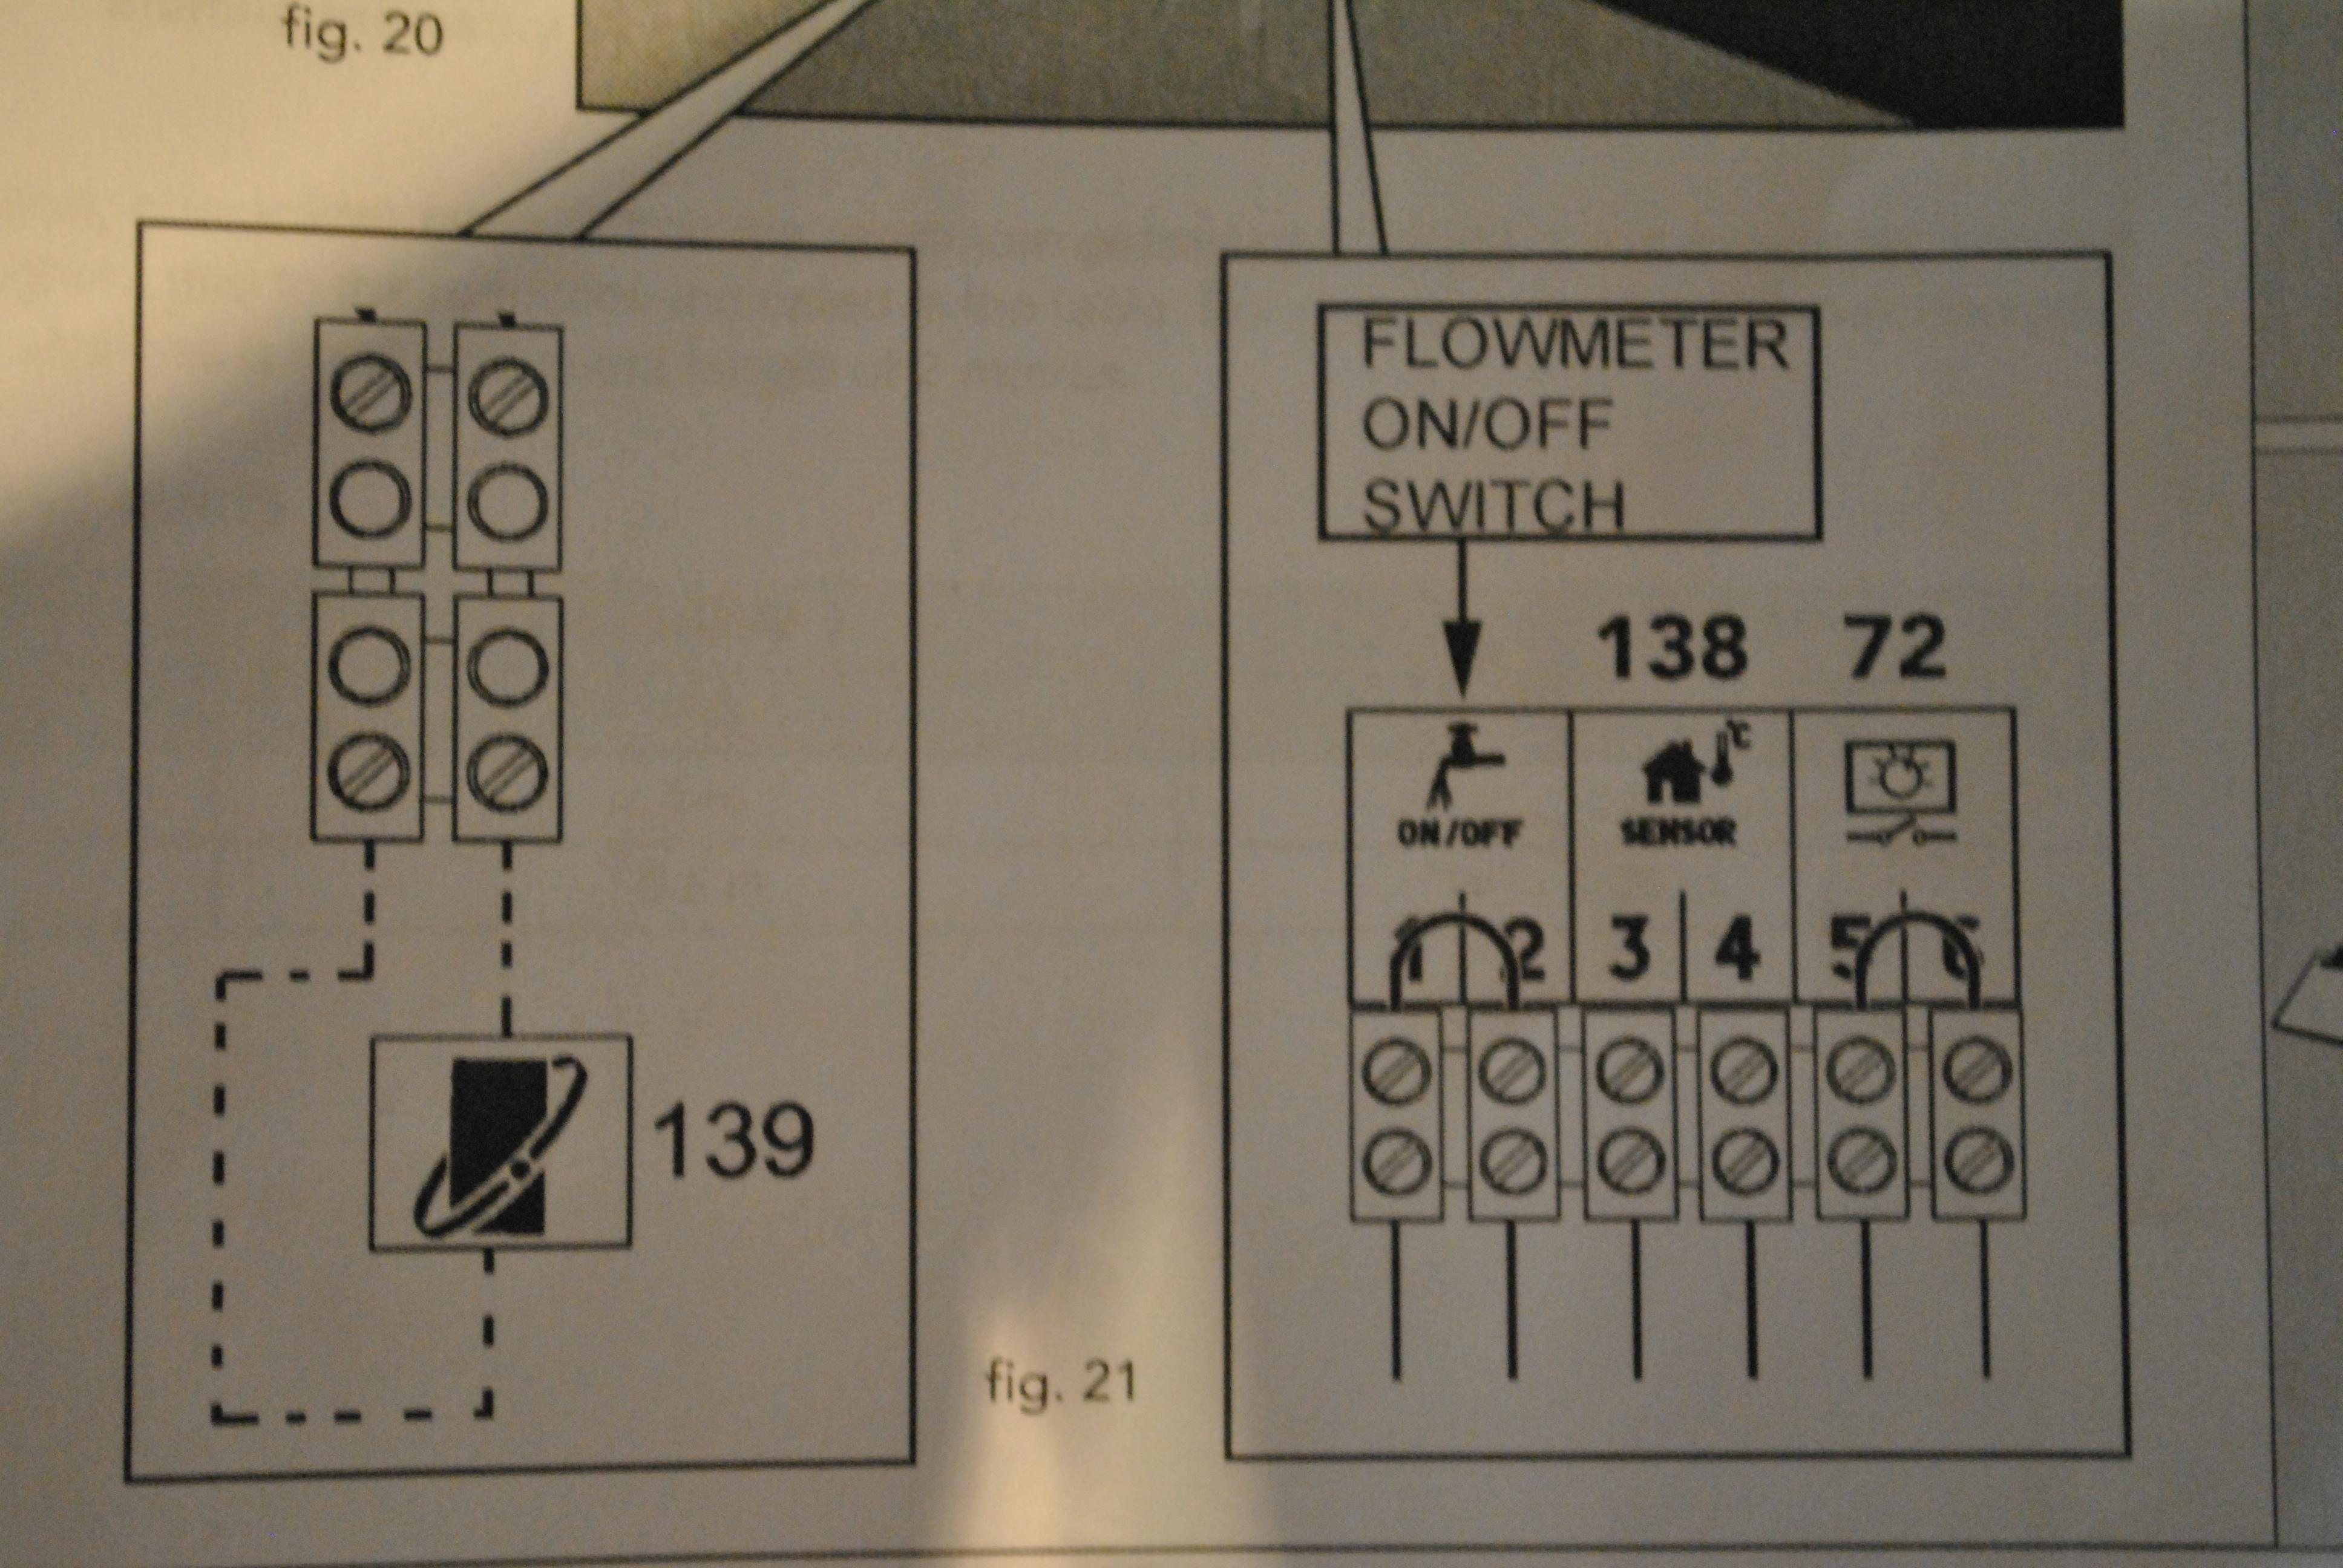 I Have A Ferroli Optimax He Plus 38 C  Condensing Combi